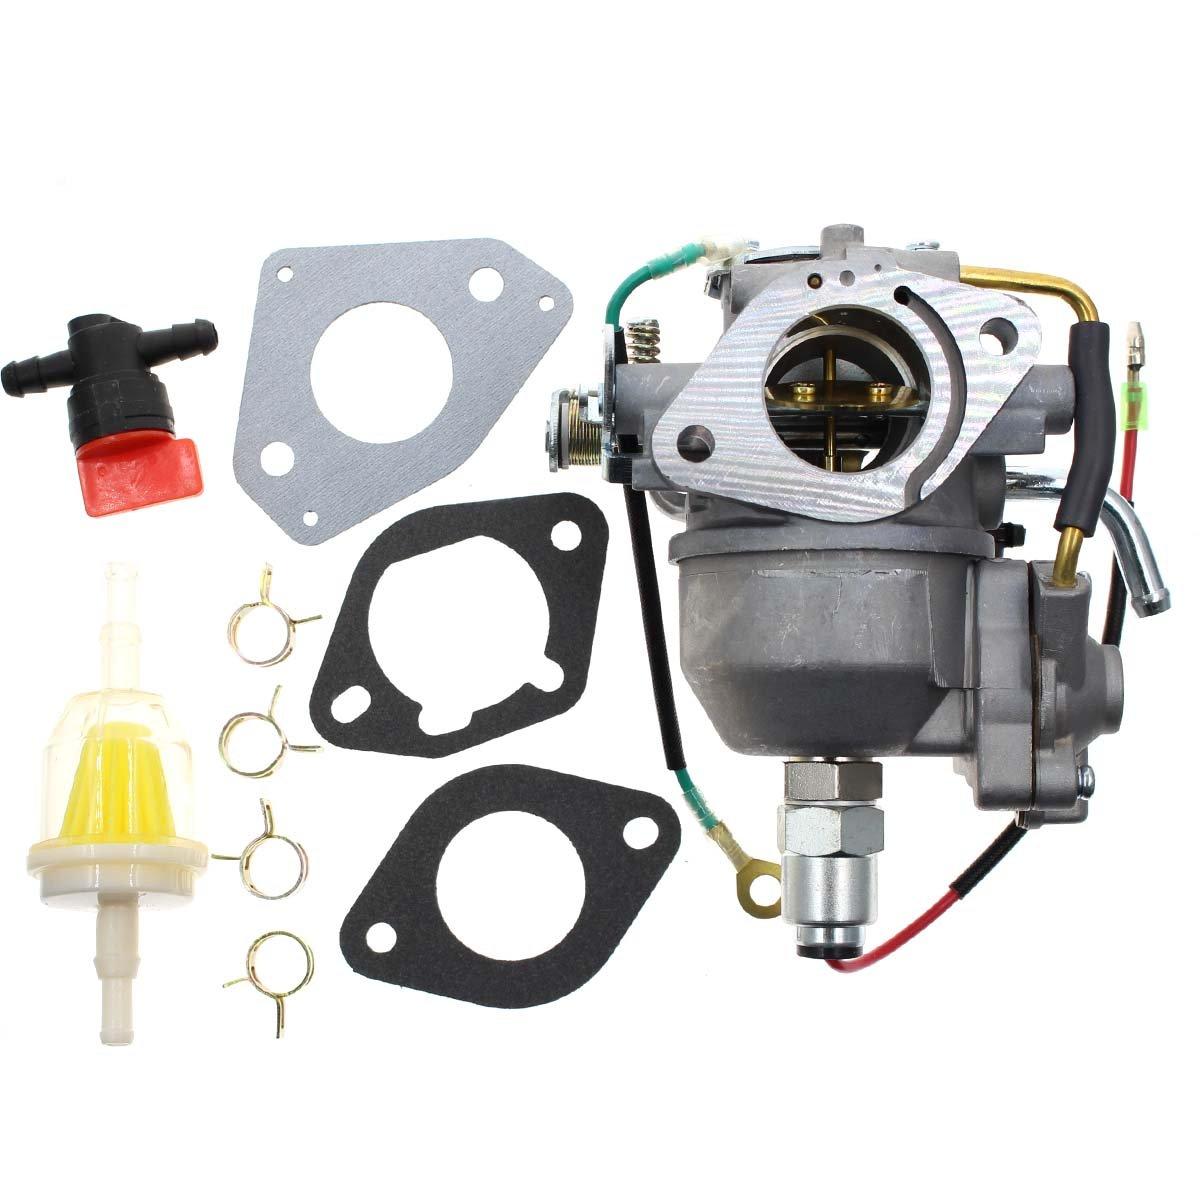 Carbhub Carburetor for Kohler CV730 CV740 25hp 27hp Engine, Replaces Kohler 24853102-S 24-853-102-S Engines for CV730 with Specs: 0039, 0040, 0041, 0042, 0043, 0044, 0045, 0046 by Carbhub